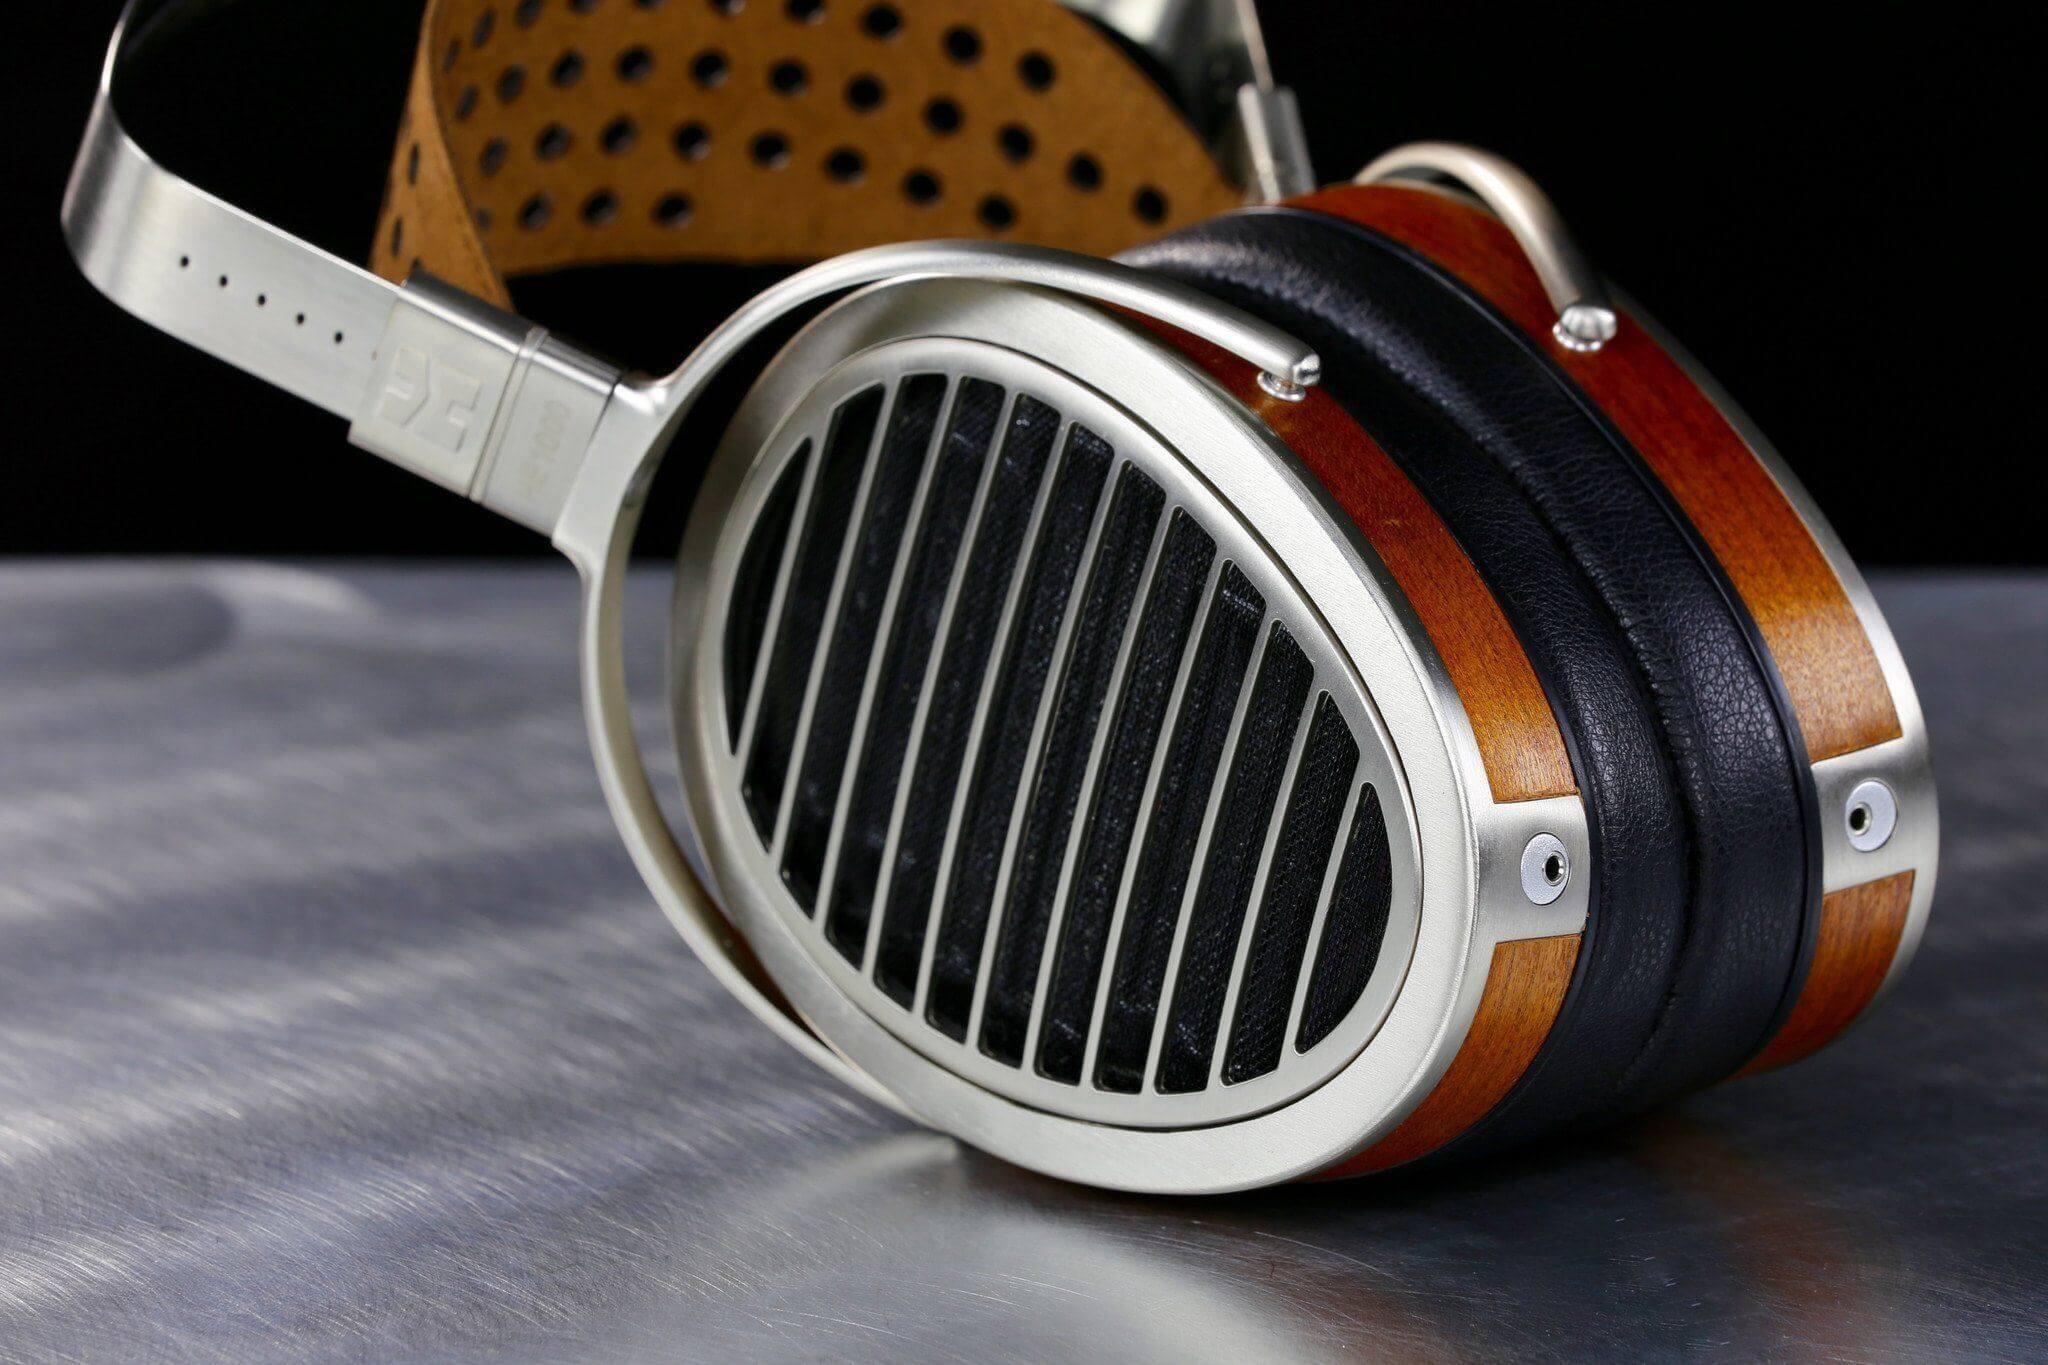 HiFiMAN HE-1000 Headphone Review